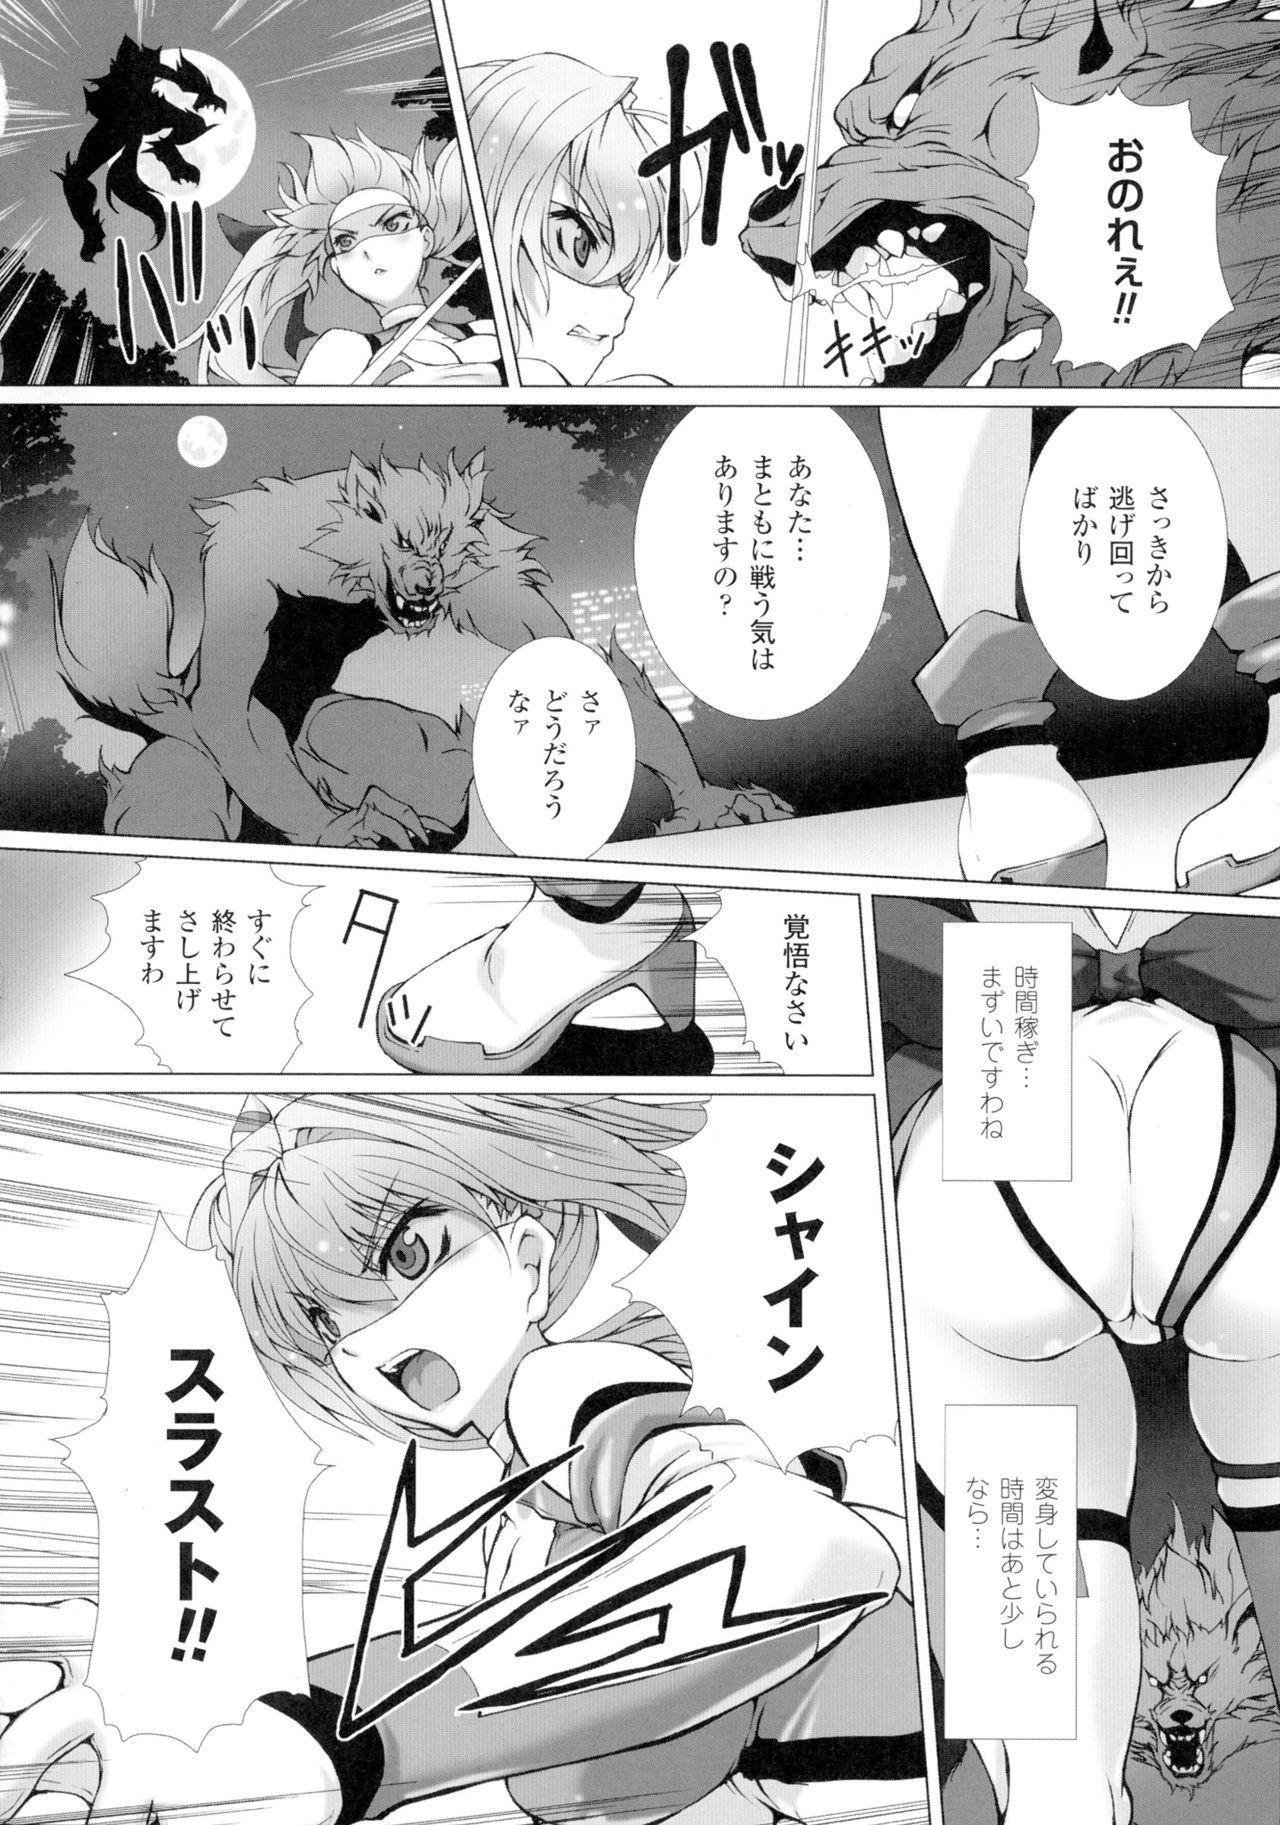 Seigi no Heroine Kangoku File DX Vol. 1 72